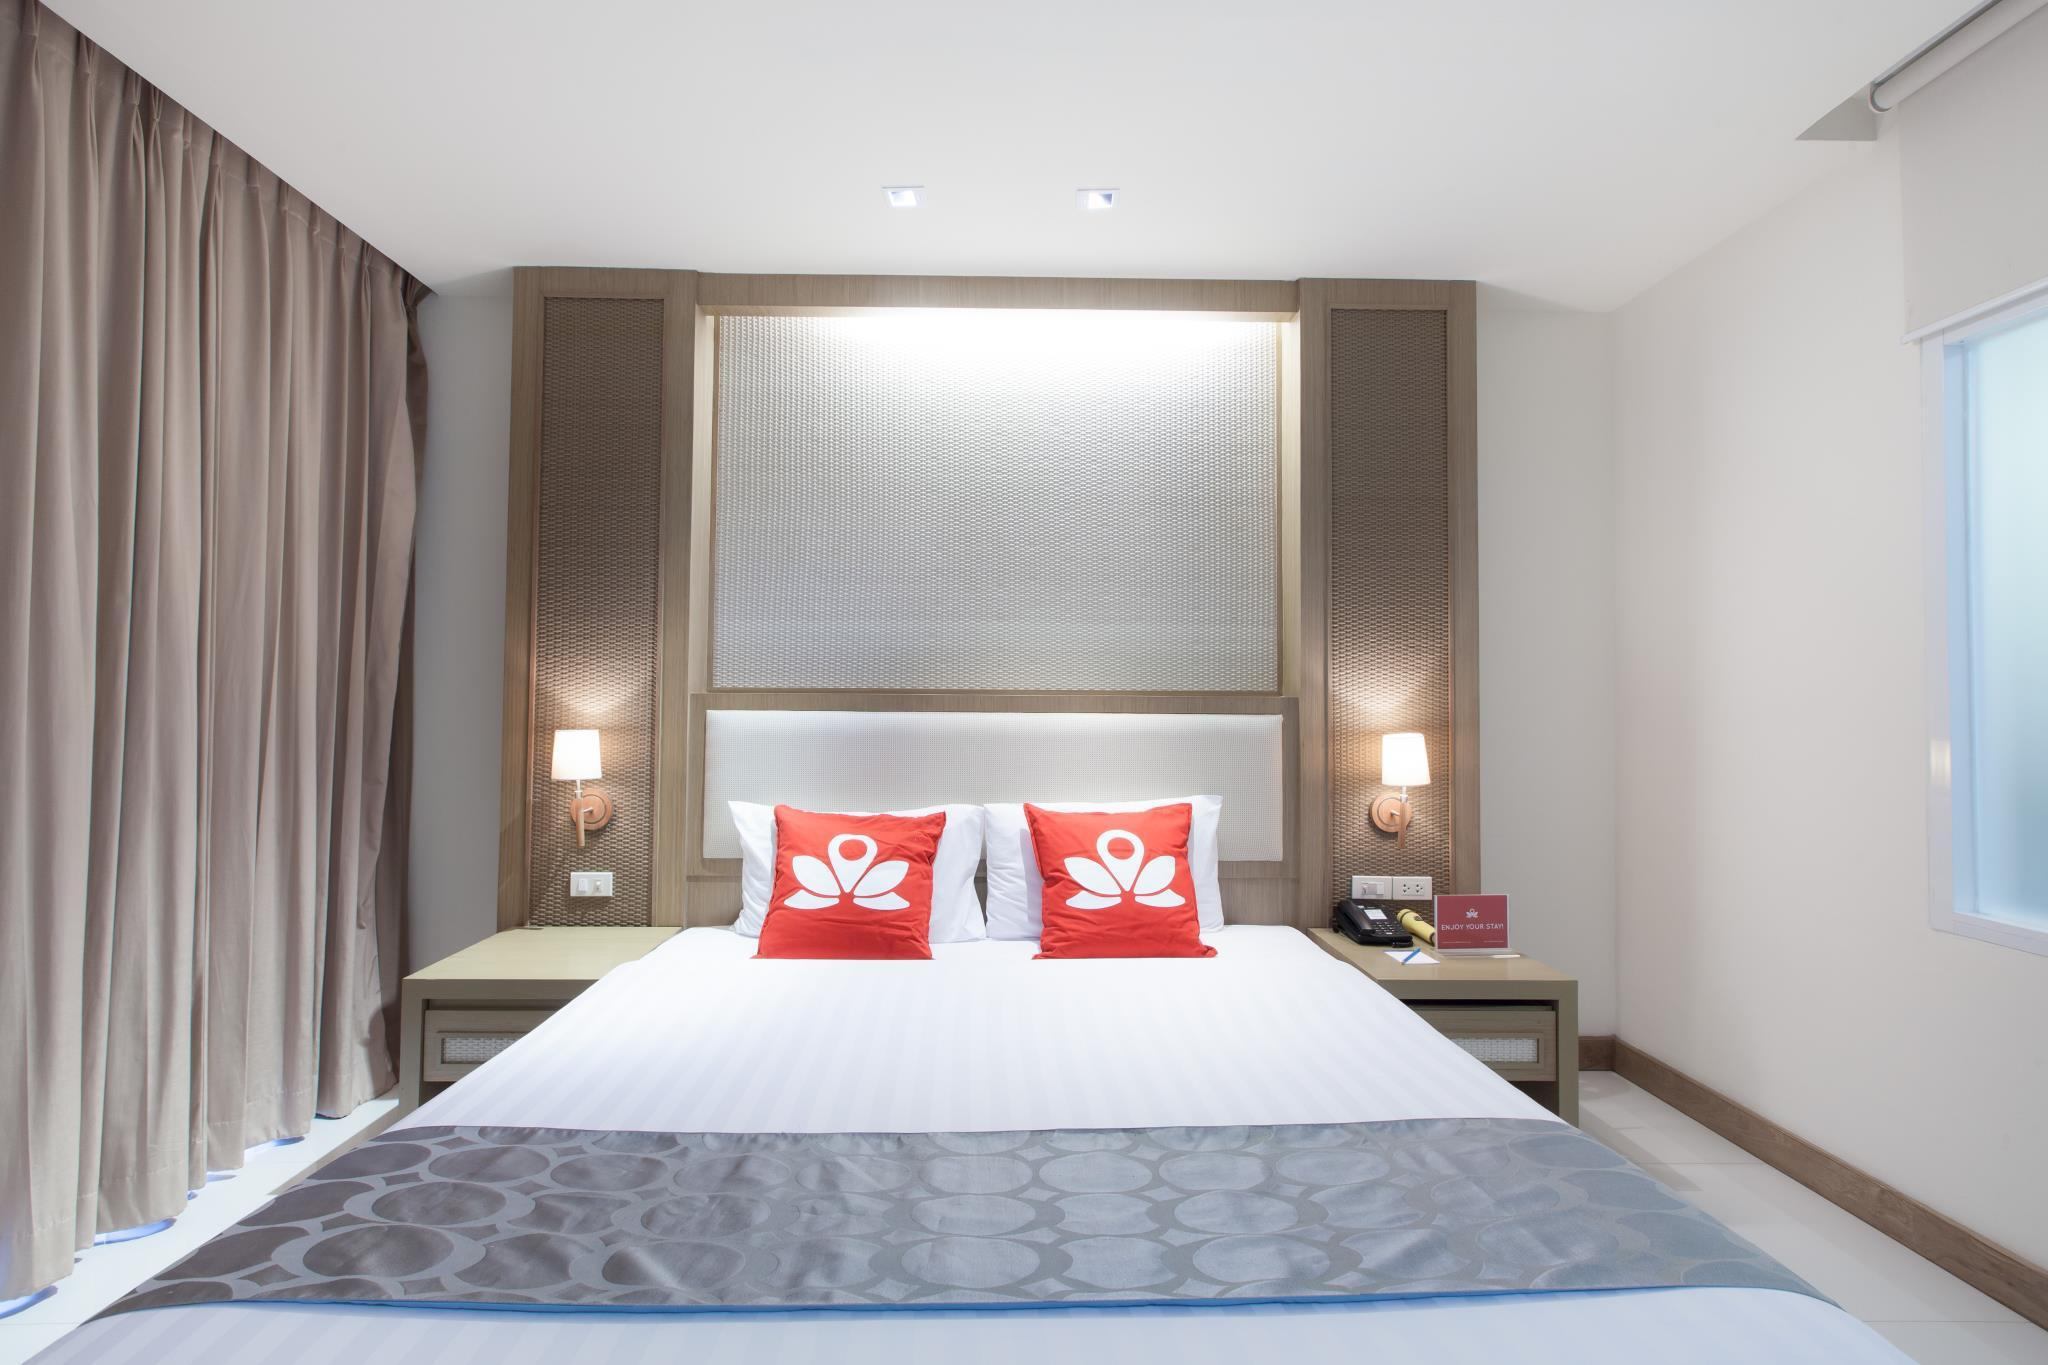 ZEN Premium Marlin Plaza Patong เซน พรีเมียม มาร์ลิน พลาซา ป่าตอง